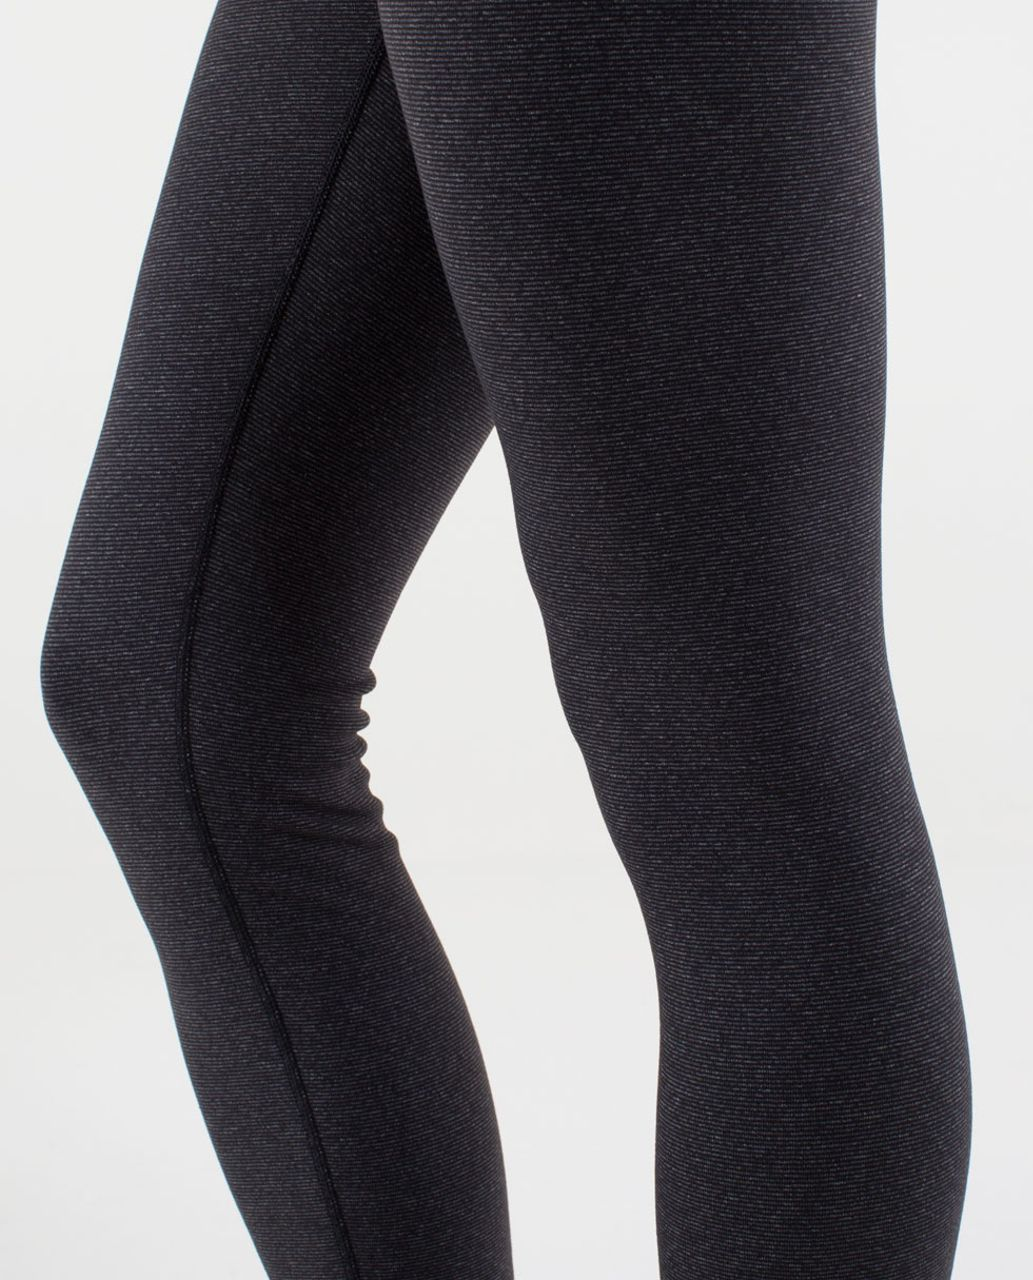 Lululemon Wunder Under Pant - Wee Stripe Black Heathered Black /  Black